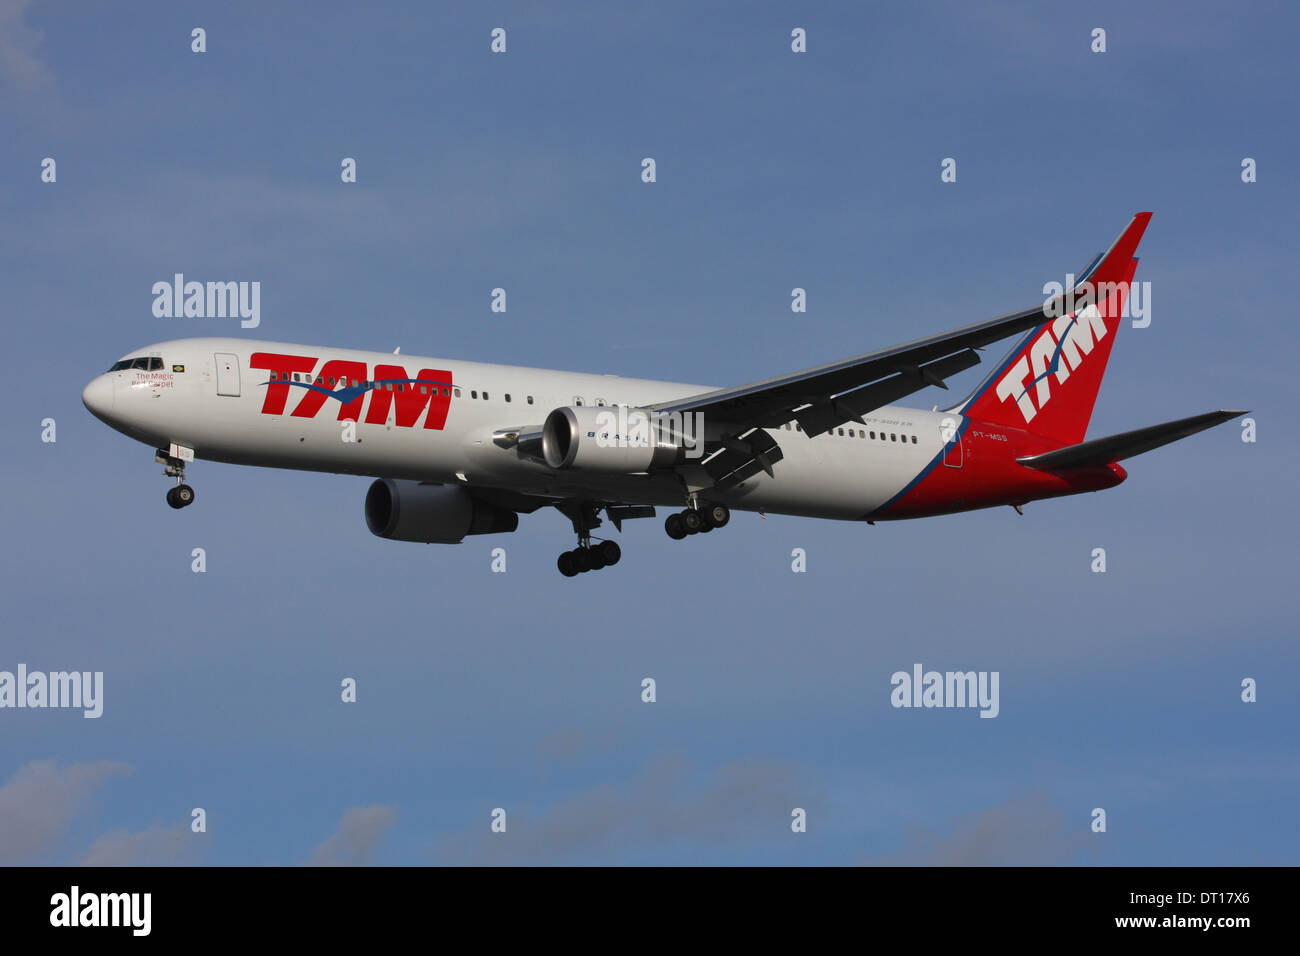 TAM BRASIL AIRLINES BOEING 767 - Stock Image